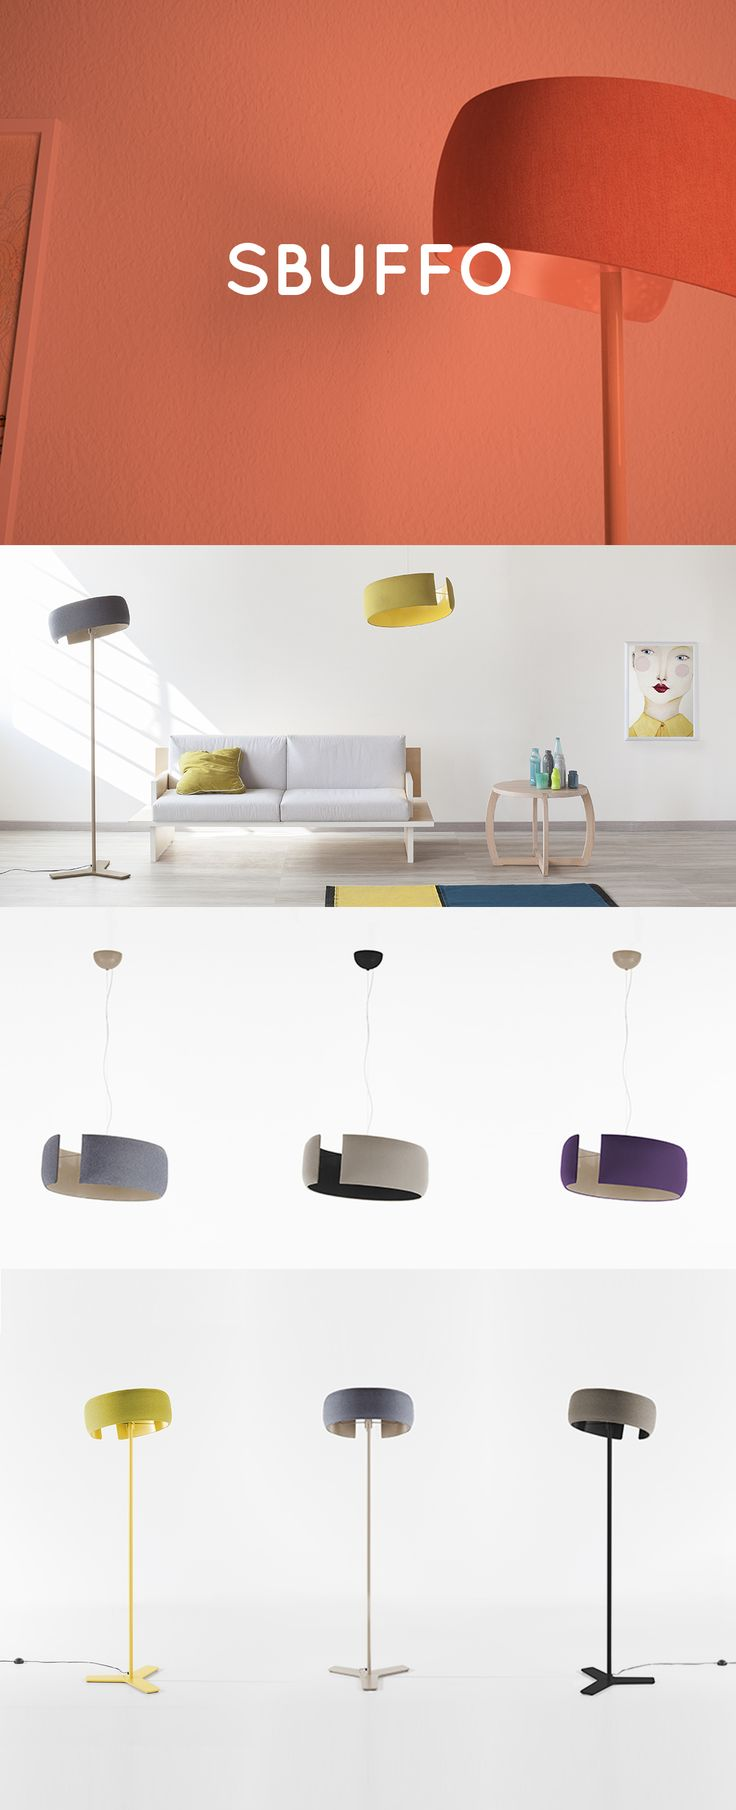 Furniture Design -  Sbuffo by Formabilo